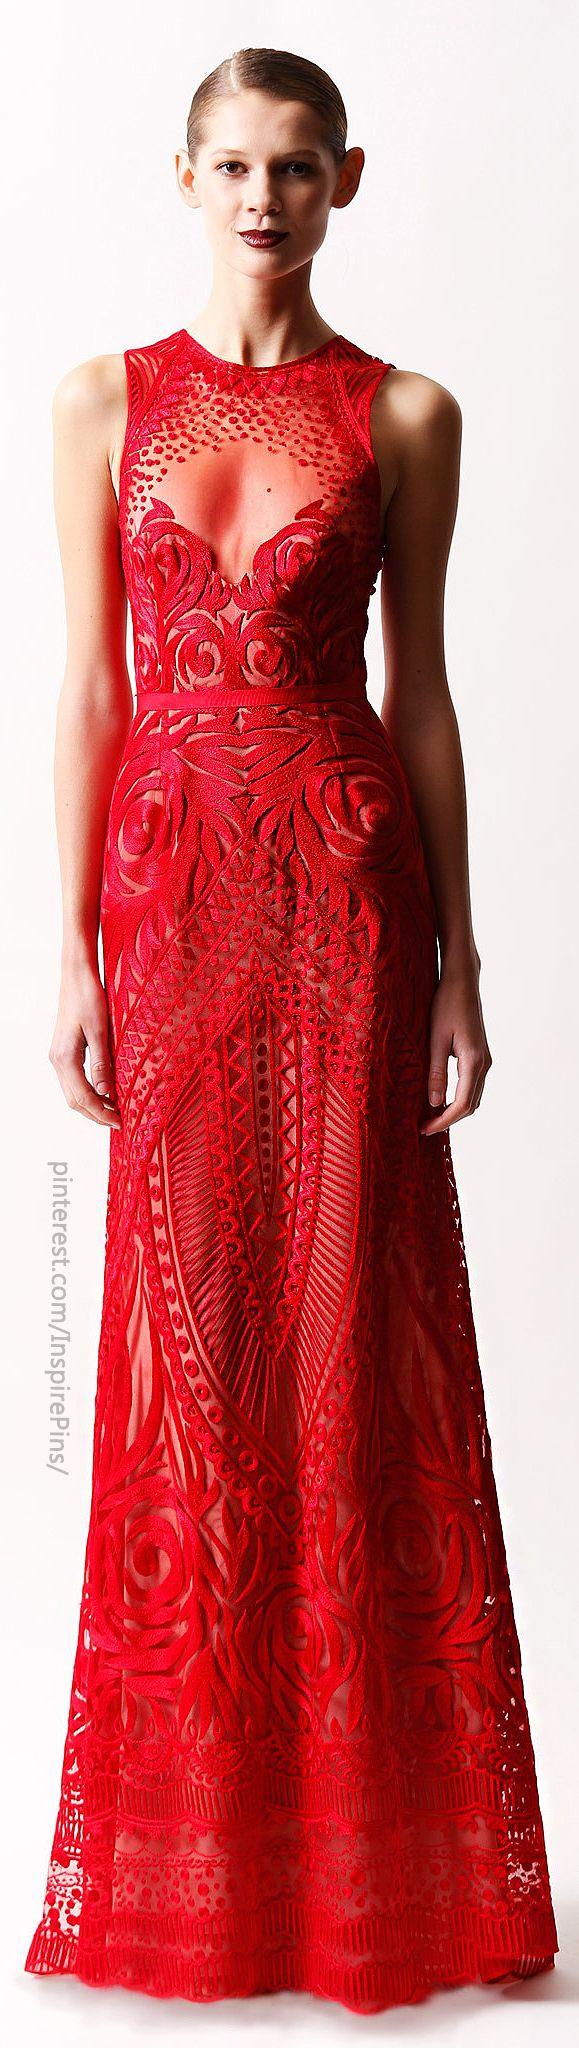 червена бална рокля на валентино